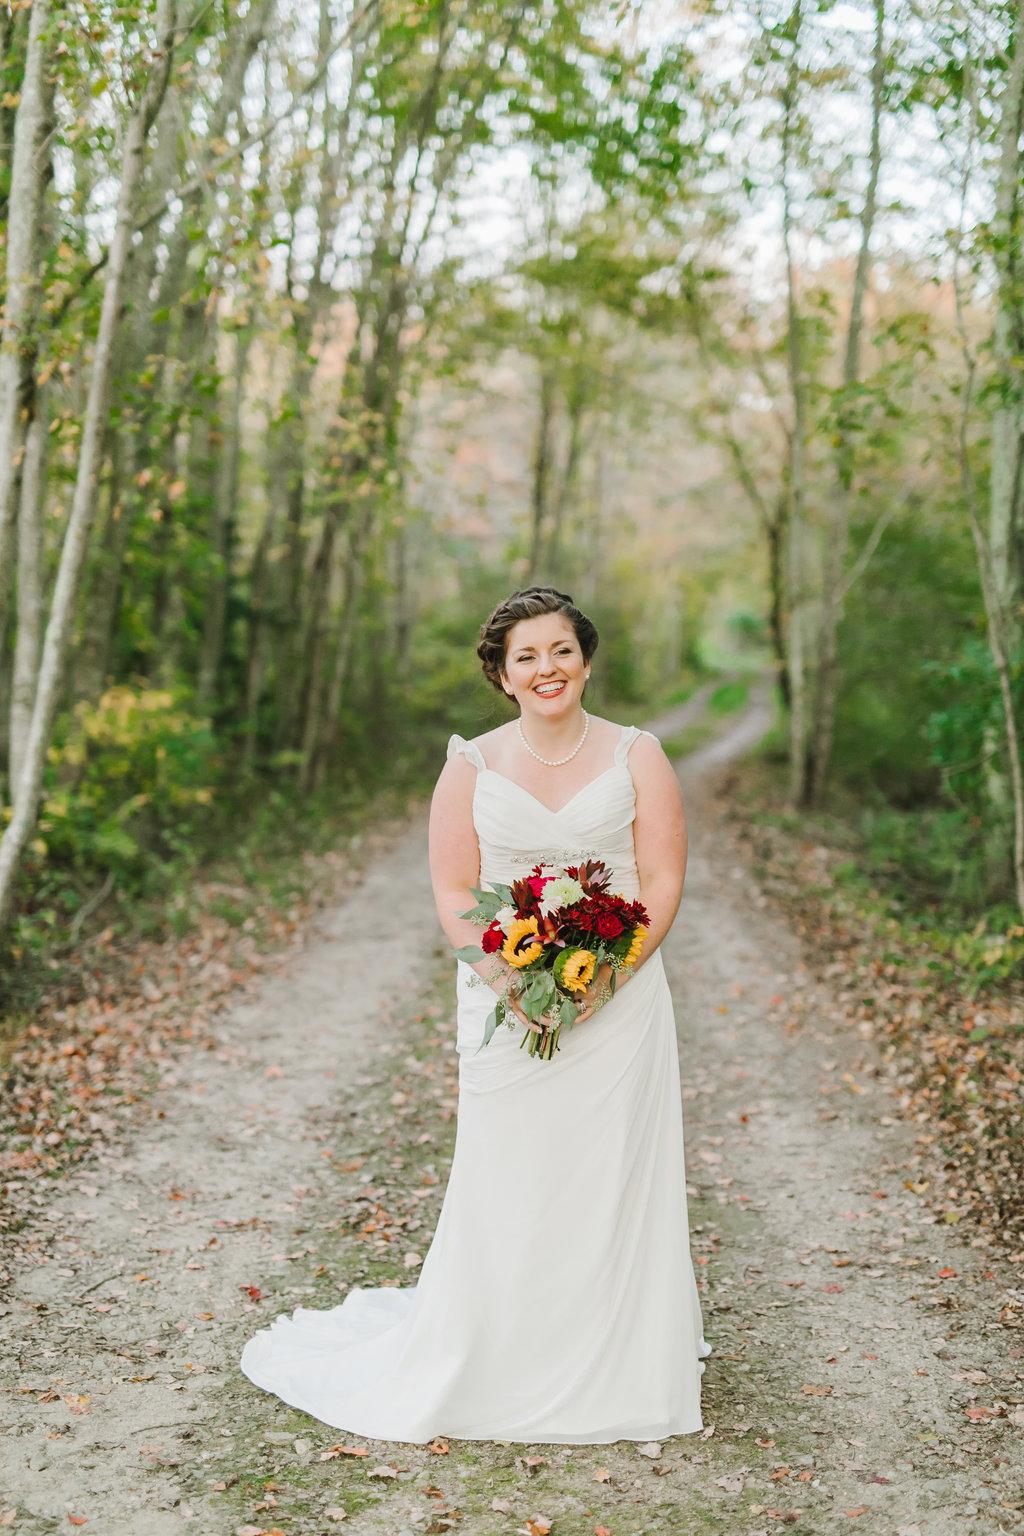 Amanda+MarkWedding-EmilyTebbettsPhotography-363.jpg